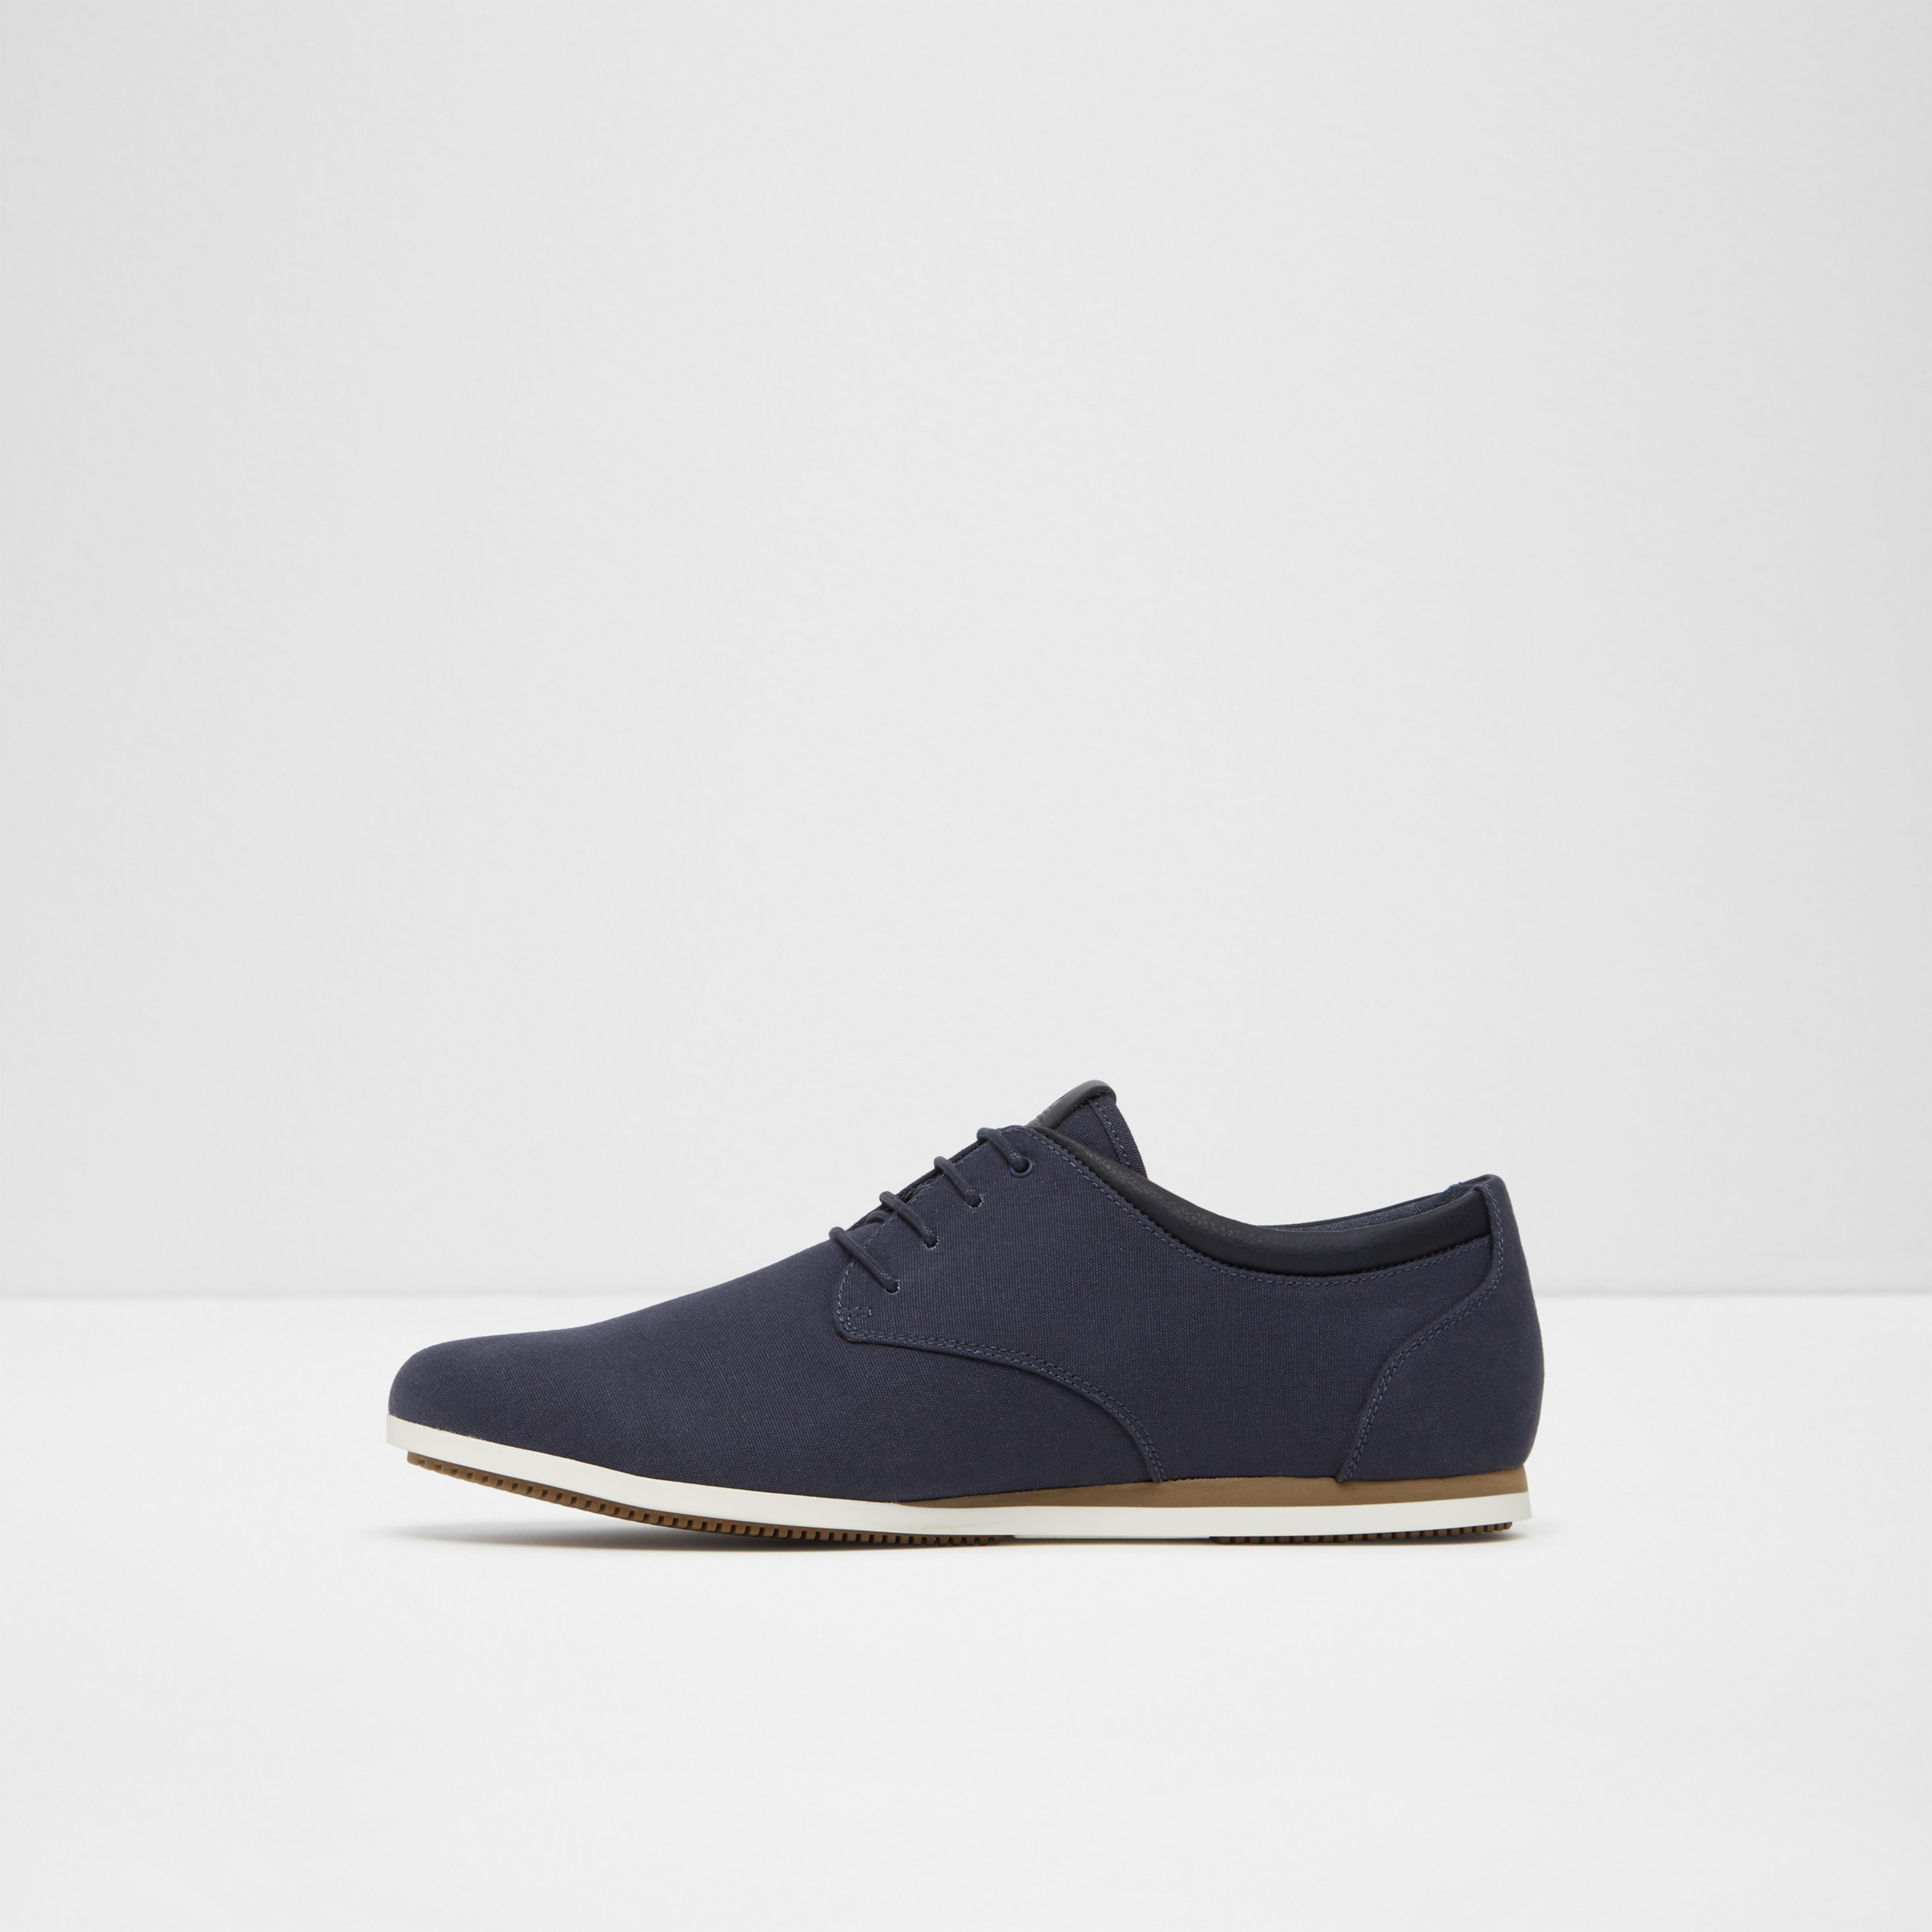 aldo shoes reddit nba 2k17